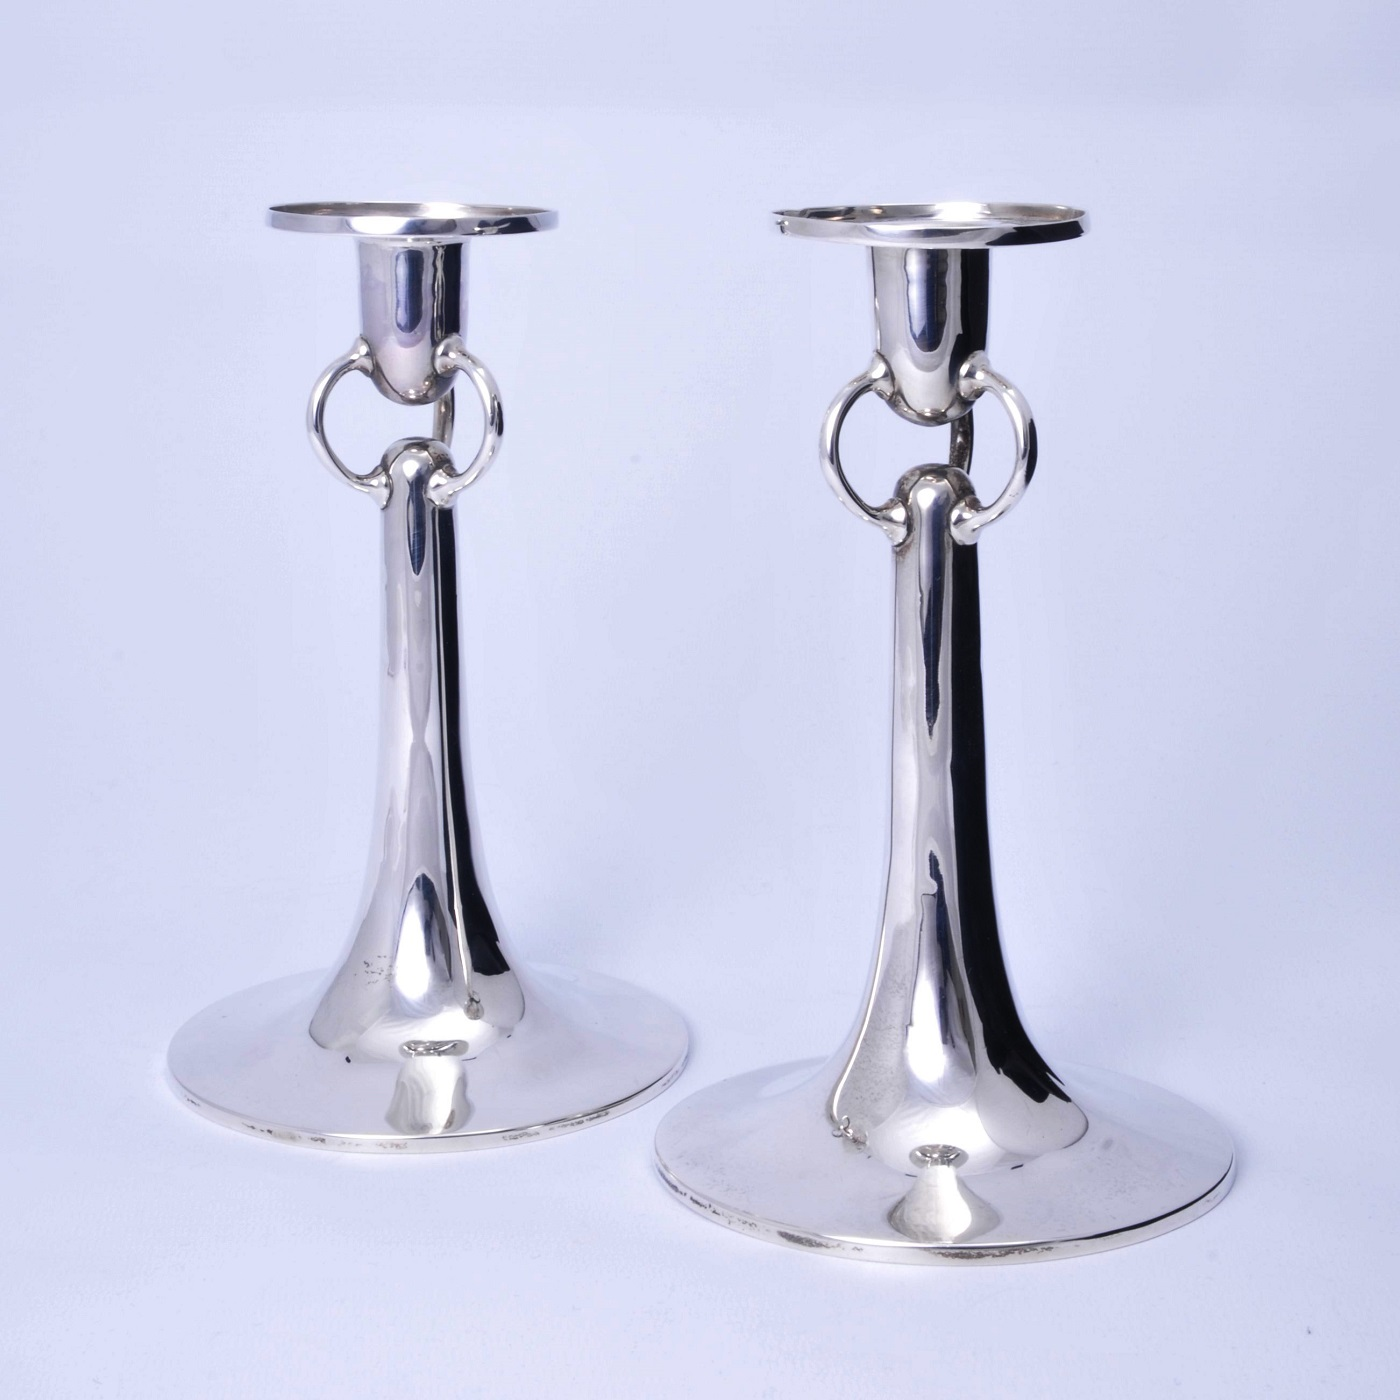 Arts and crafts modernist silver candlesticks